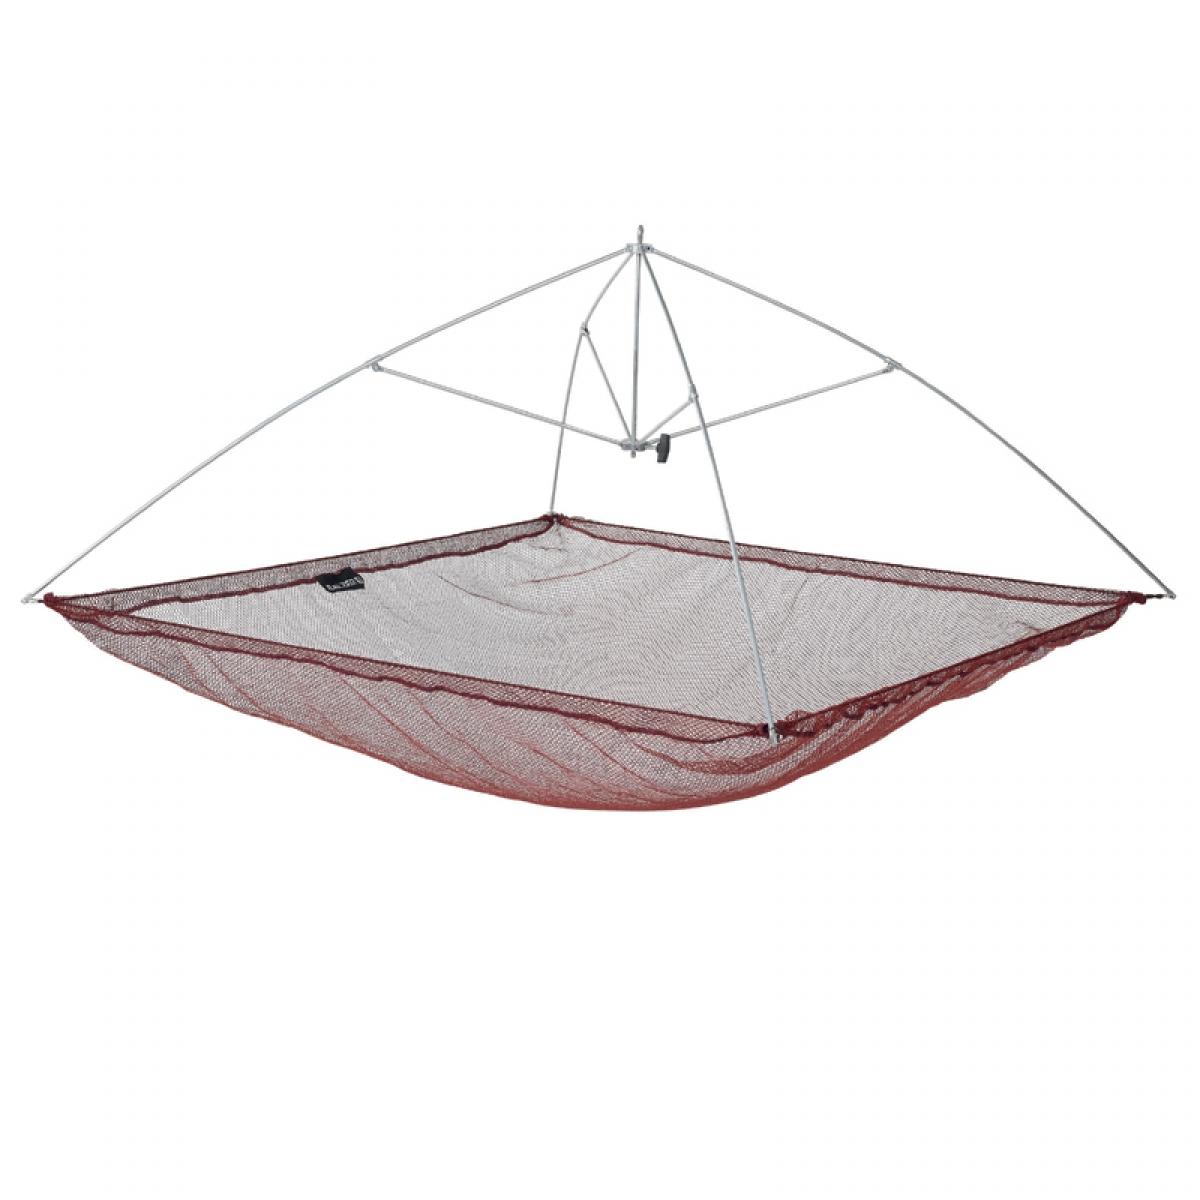 Balzer bait fish drop net umbrella system boddenangler for Drop net fishing